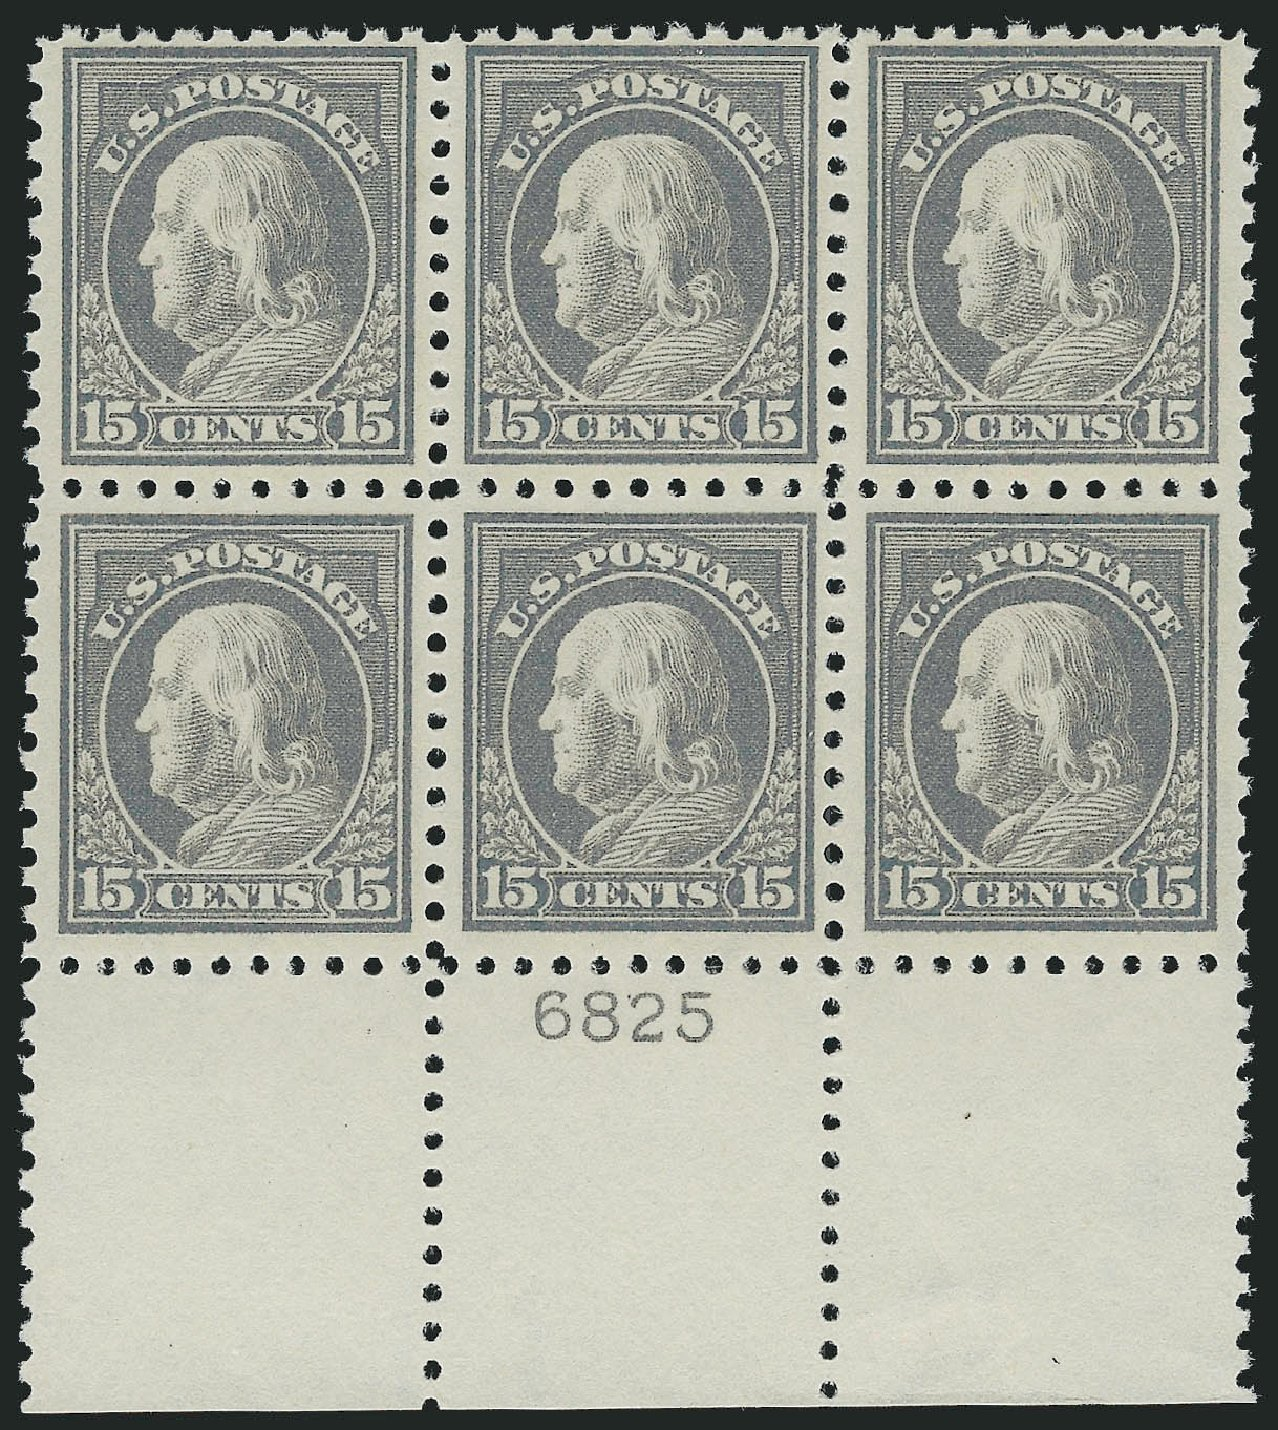 US Stamp Prices Scott 437: 1914 15c Franklin Perf 10. Robert Siegel Auction Galleries, Mar 2014, Sale 1067, Lot 1525